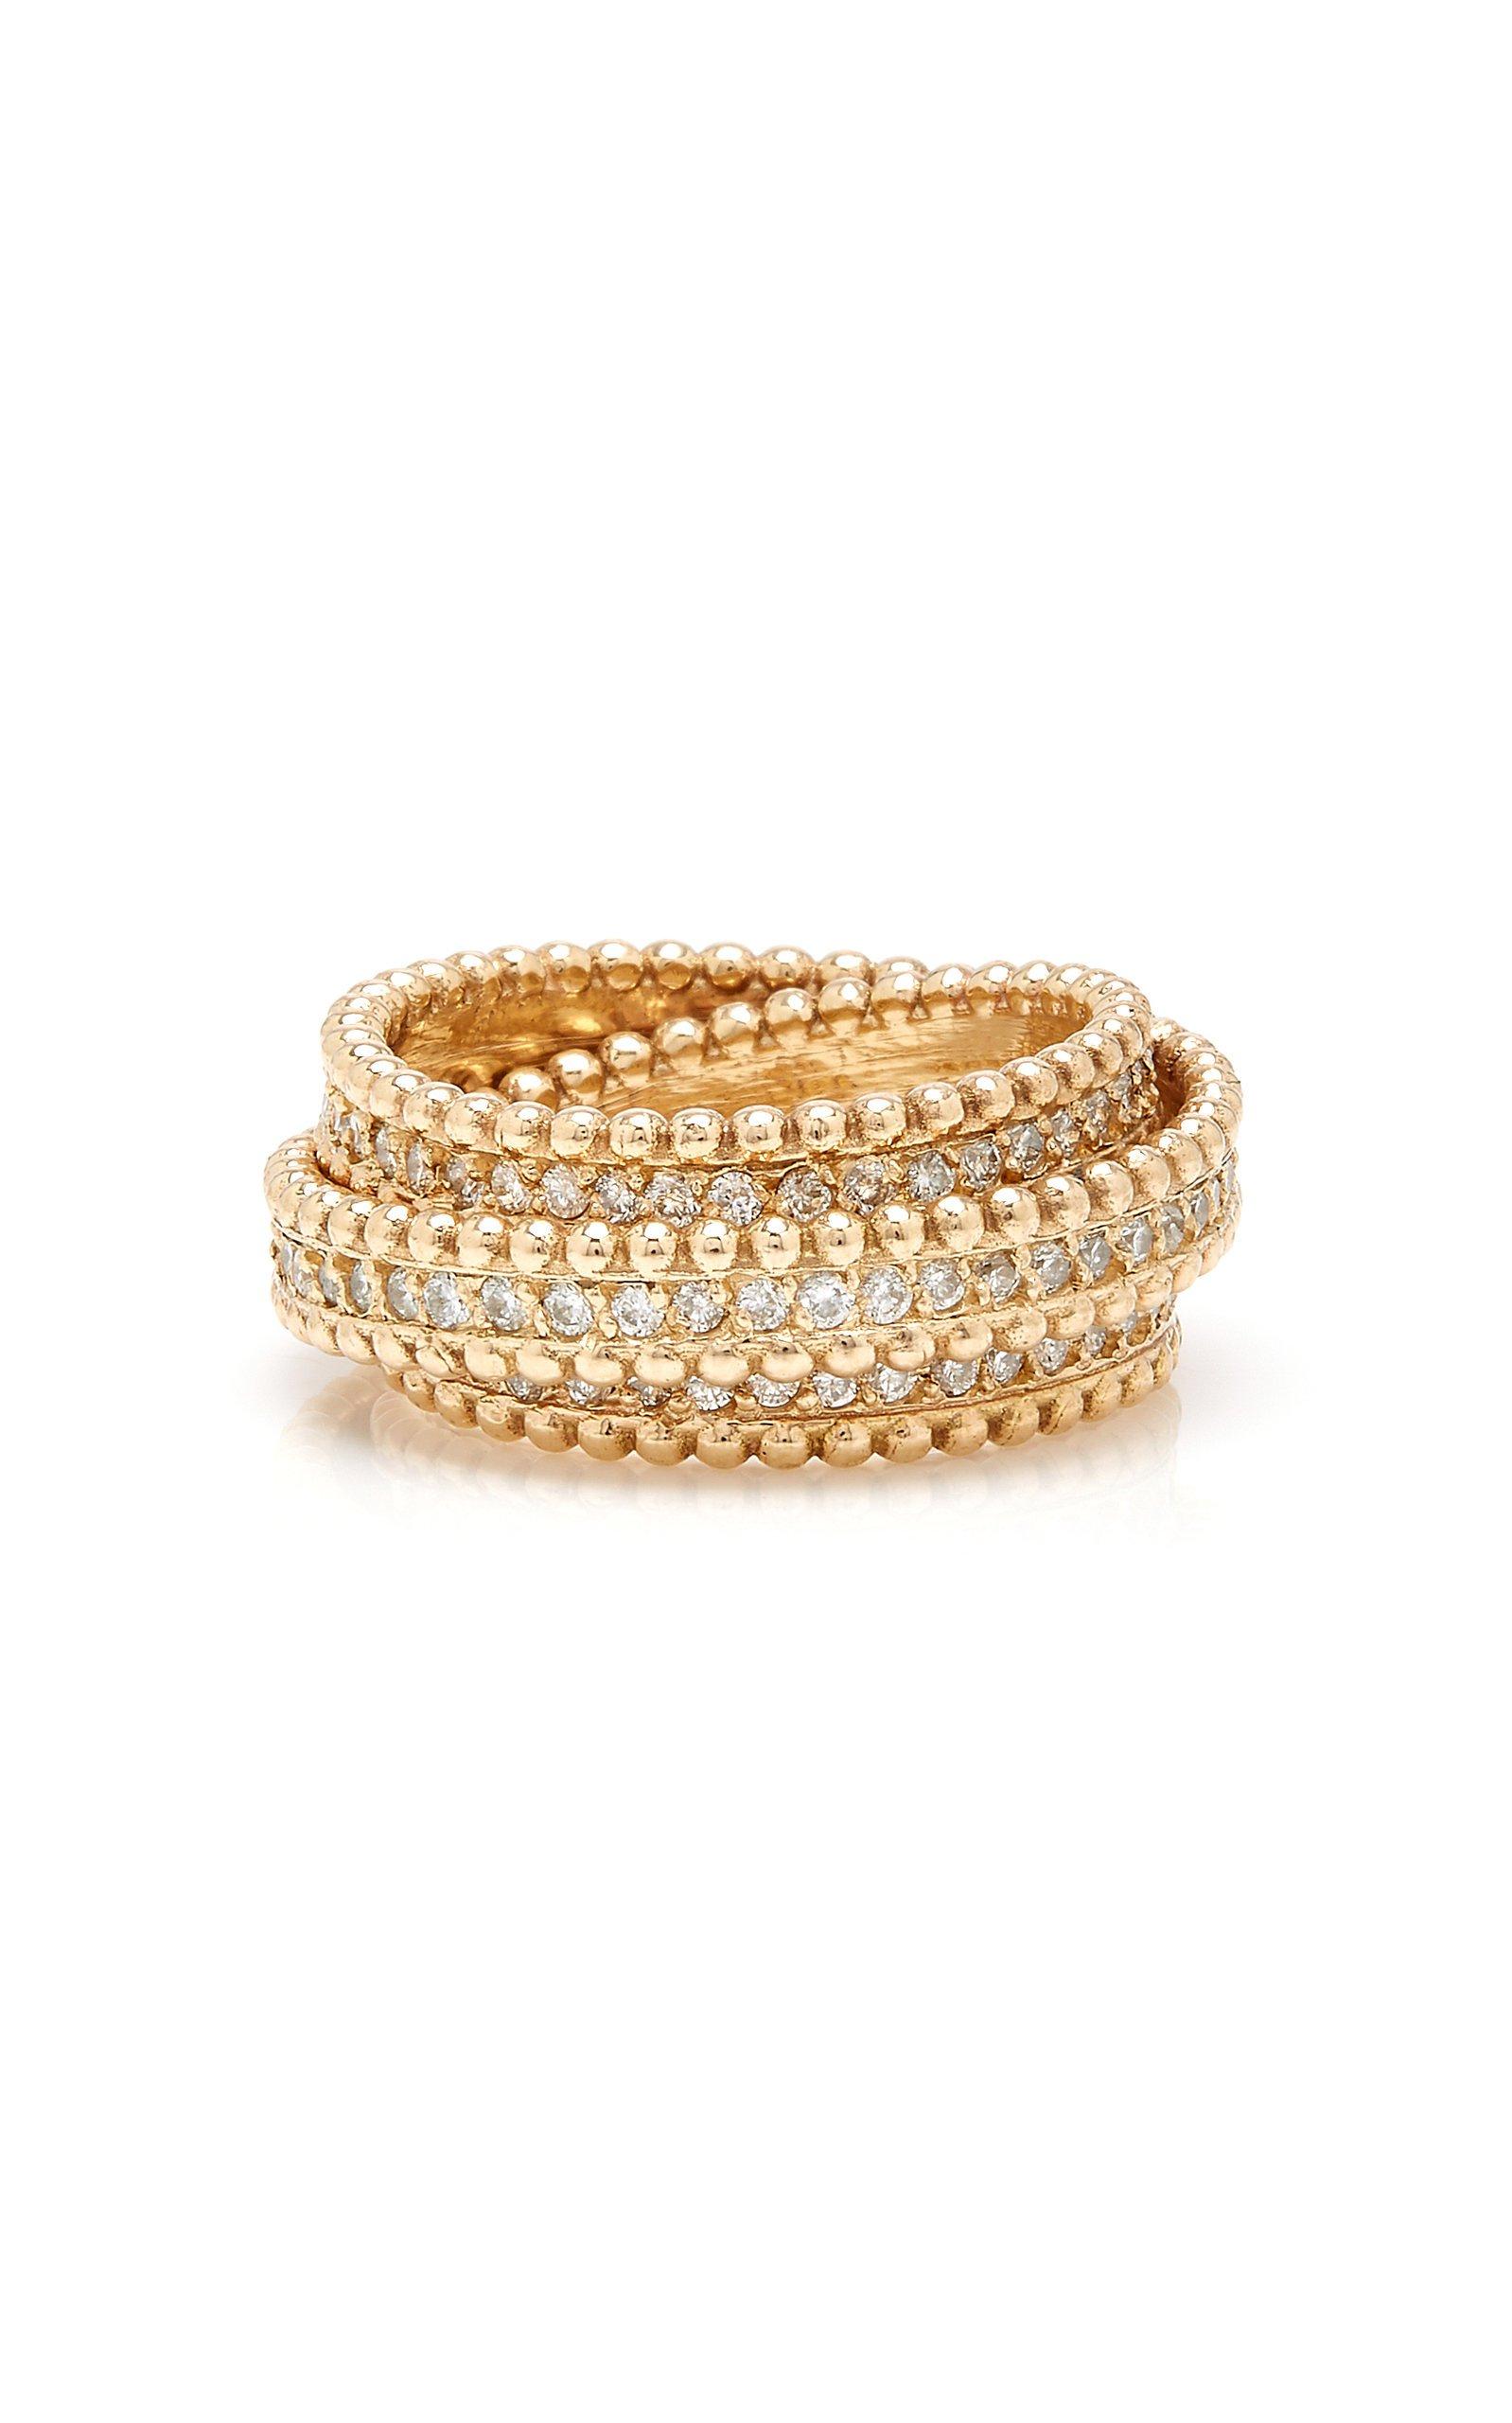 14K Gold Diamond Ring by Sophie Ratner | Moda Operandi